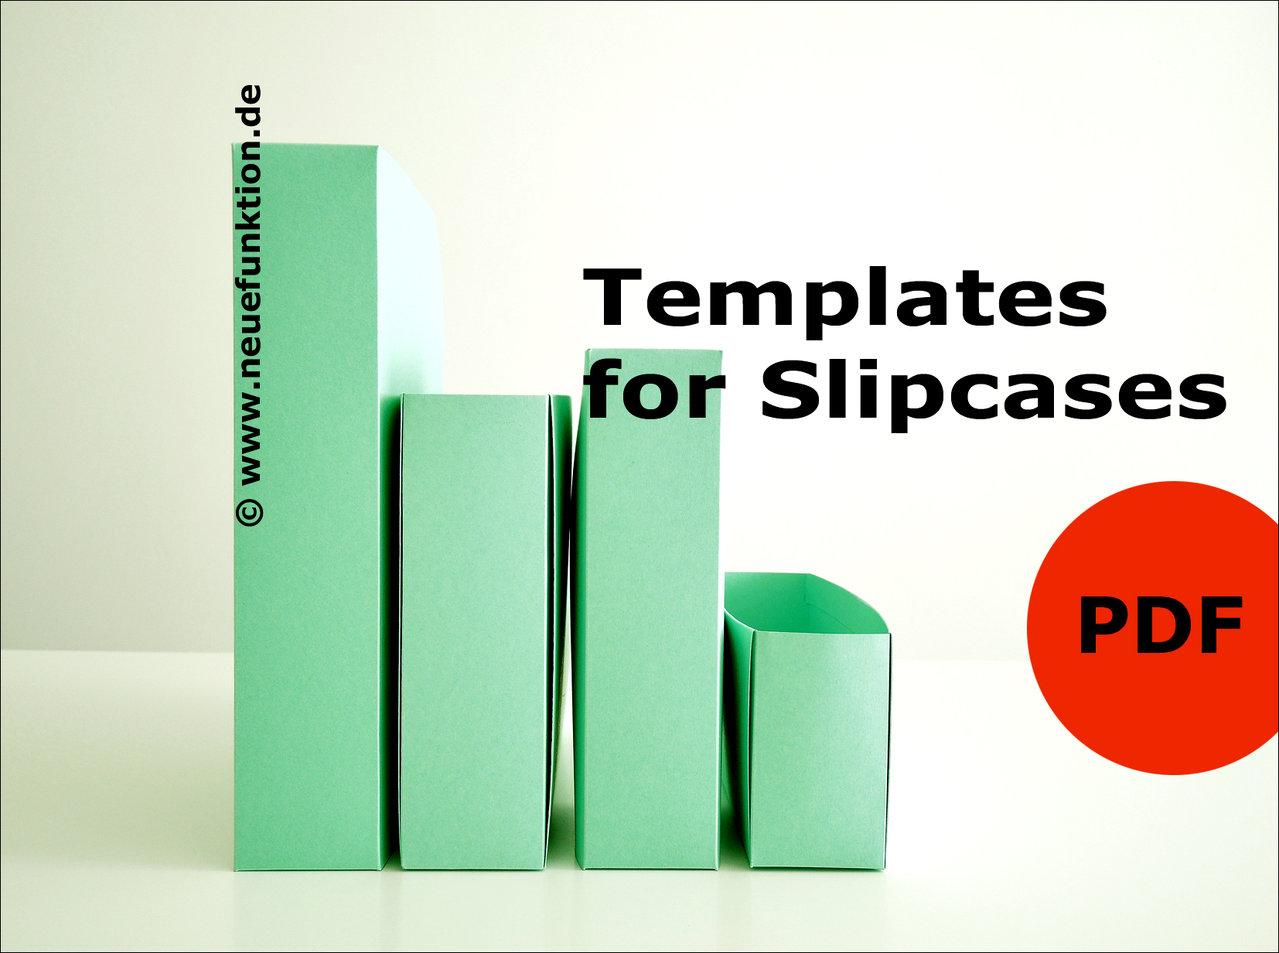 Pdf Templates | Templates For Slipcases Neuefunktion De